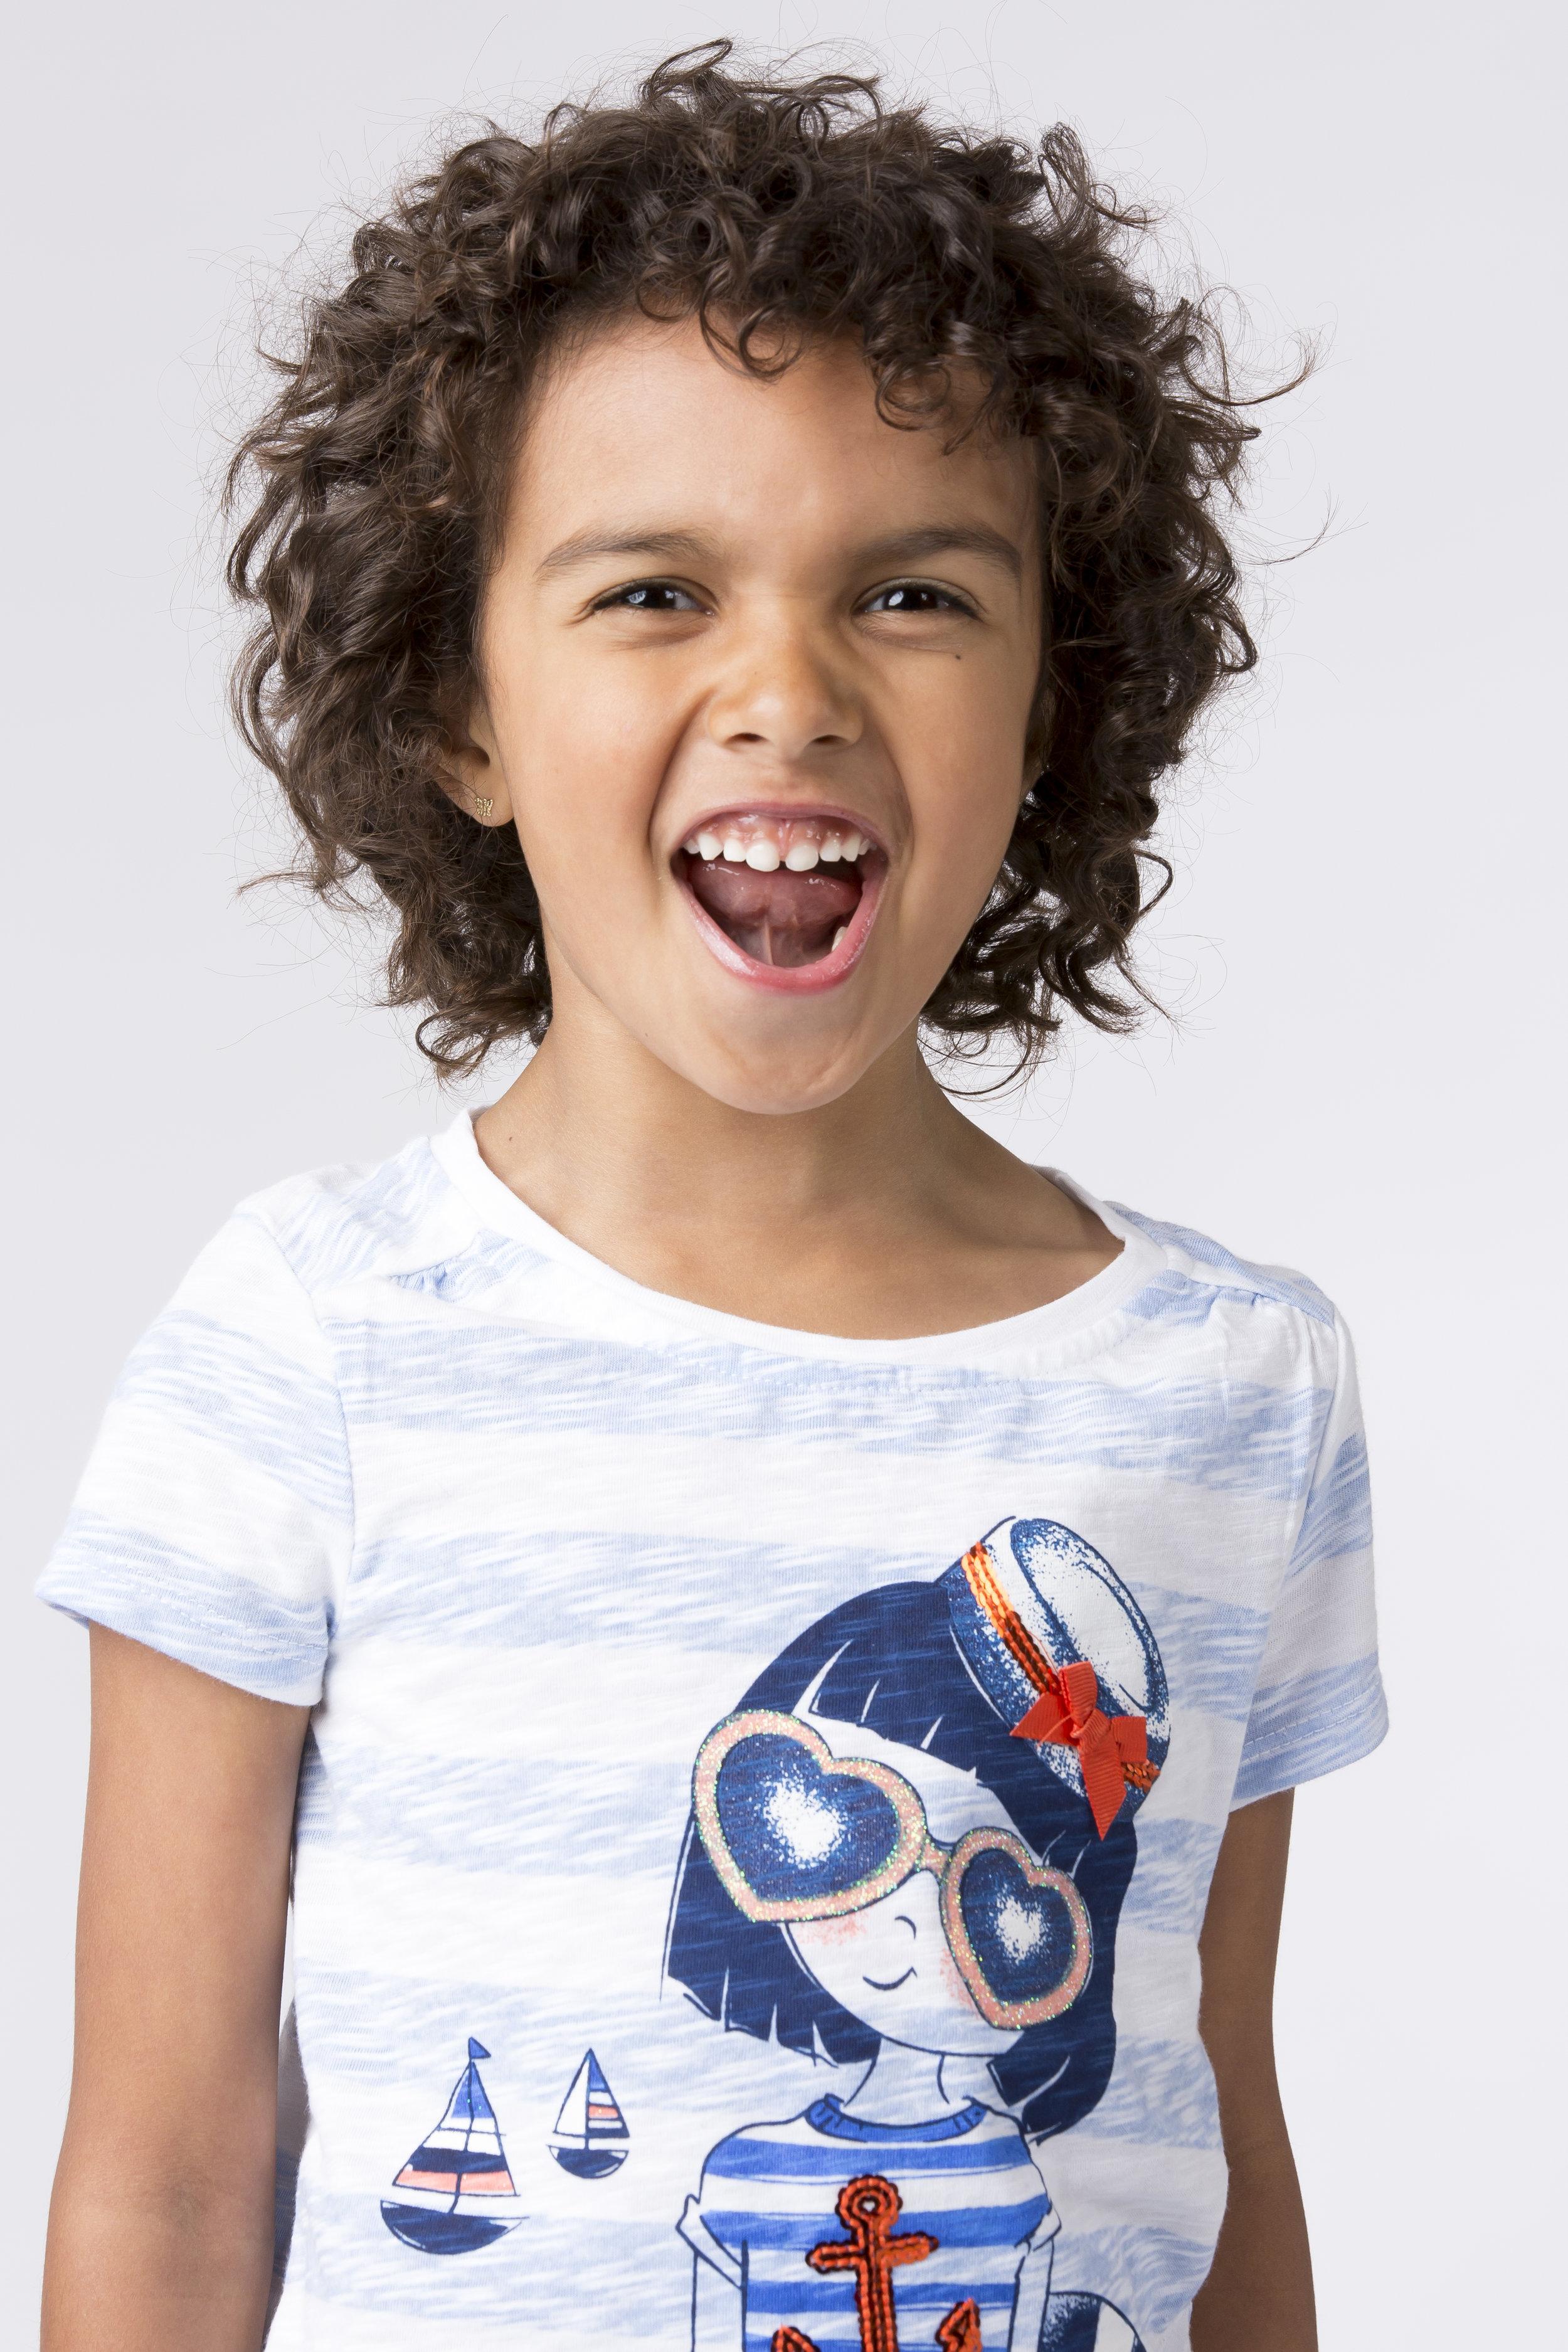 child-modeling-photography-portfolio-portland-or-vancouver-wa-MA5